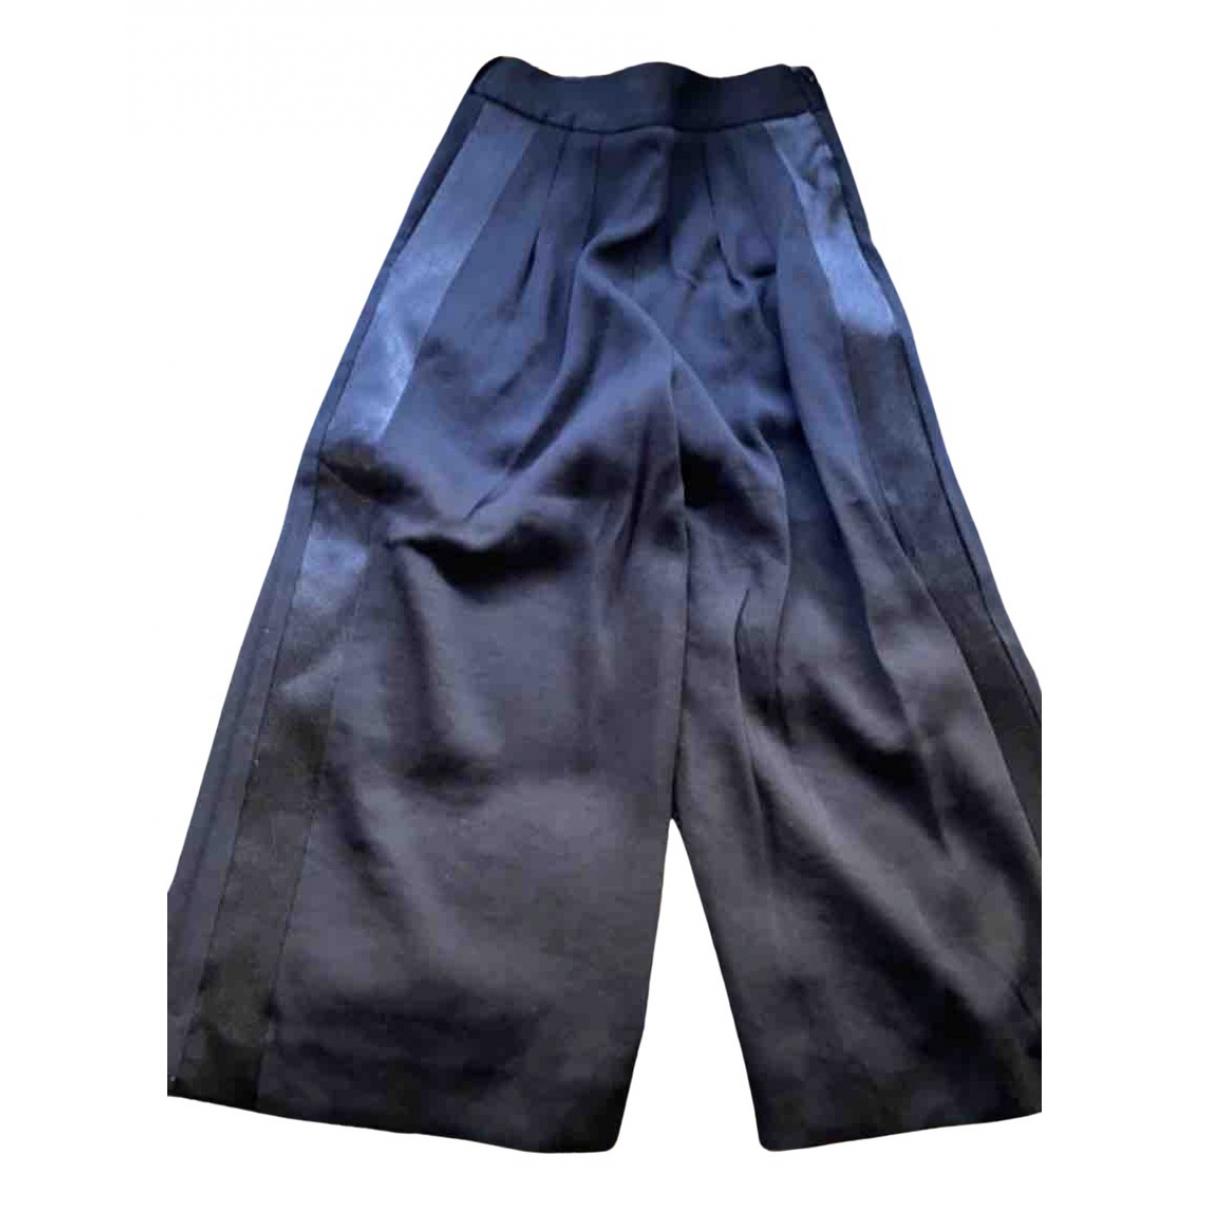 Maje Fall Winter 2019 Black Trousers for Women 36 FR